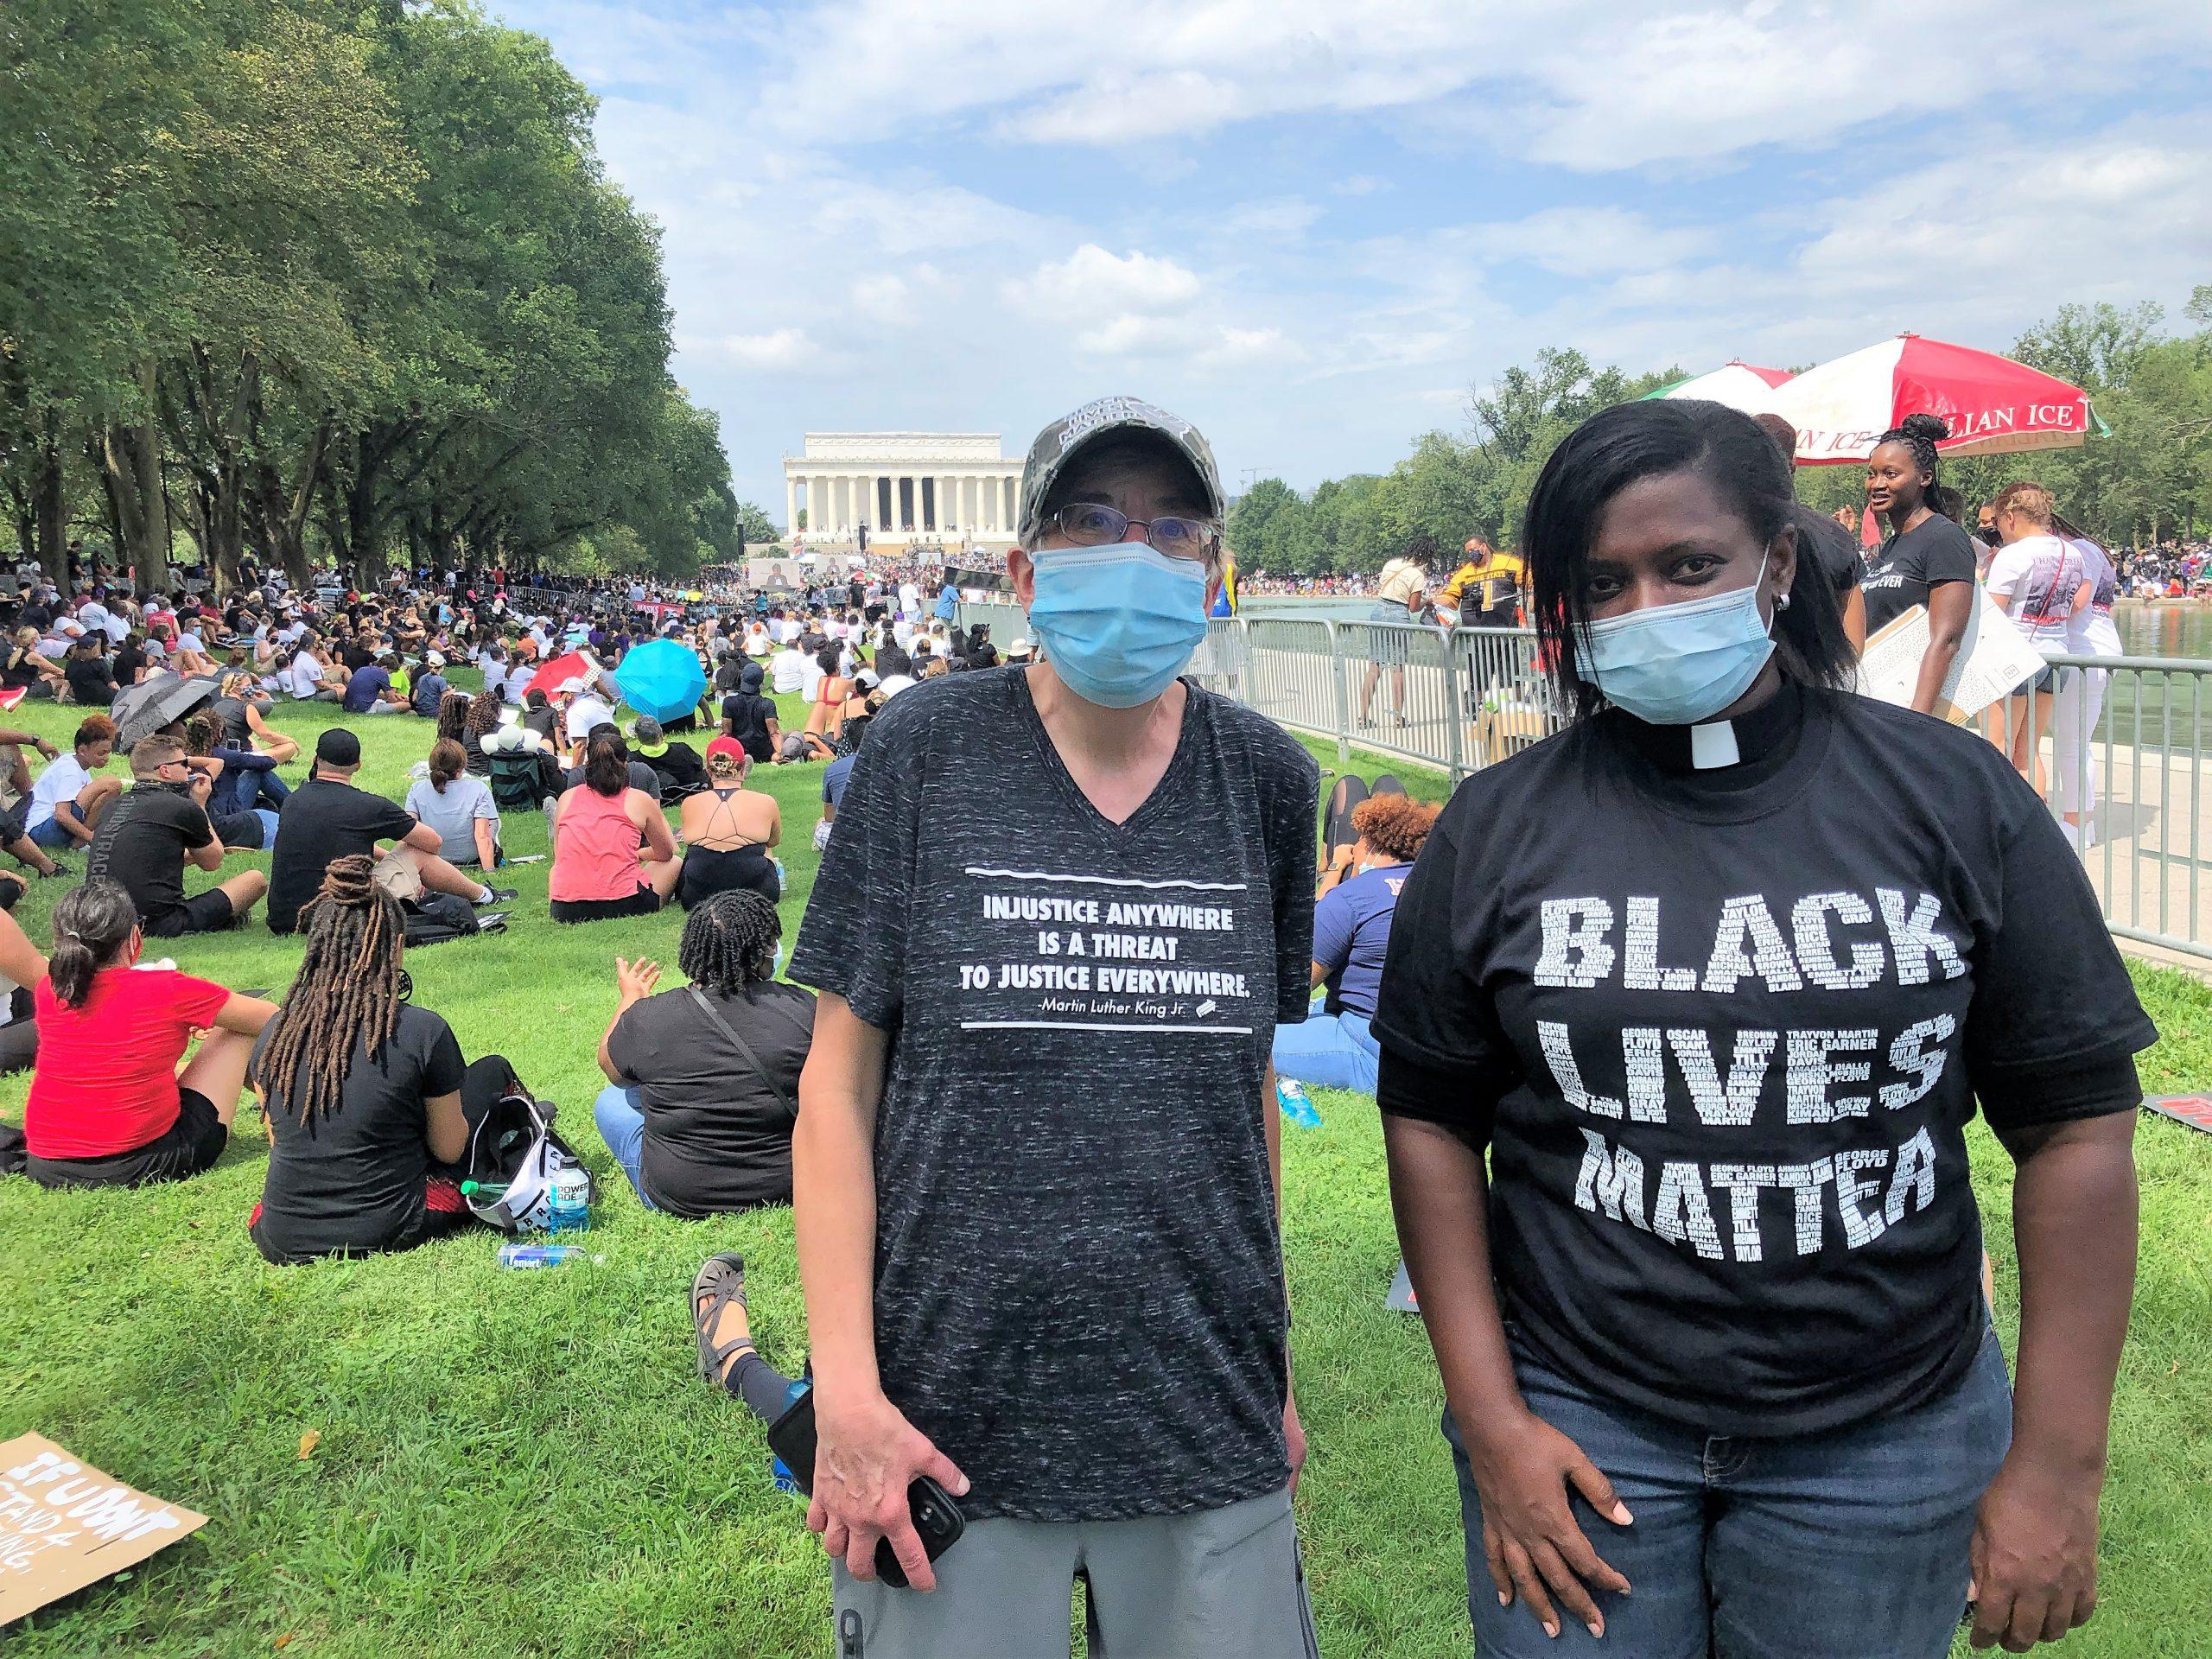 Sorensen & Guillaume at D.C. rally, 8/28/20